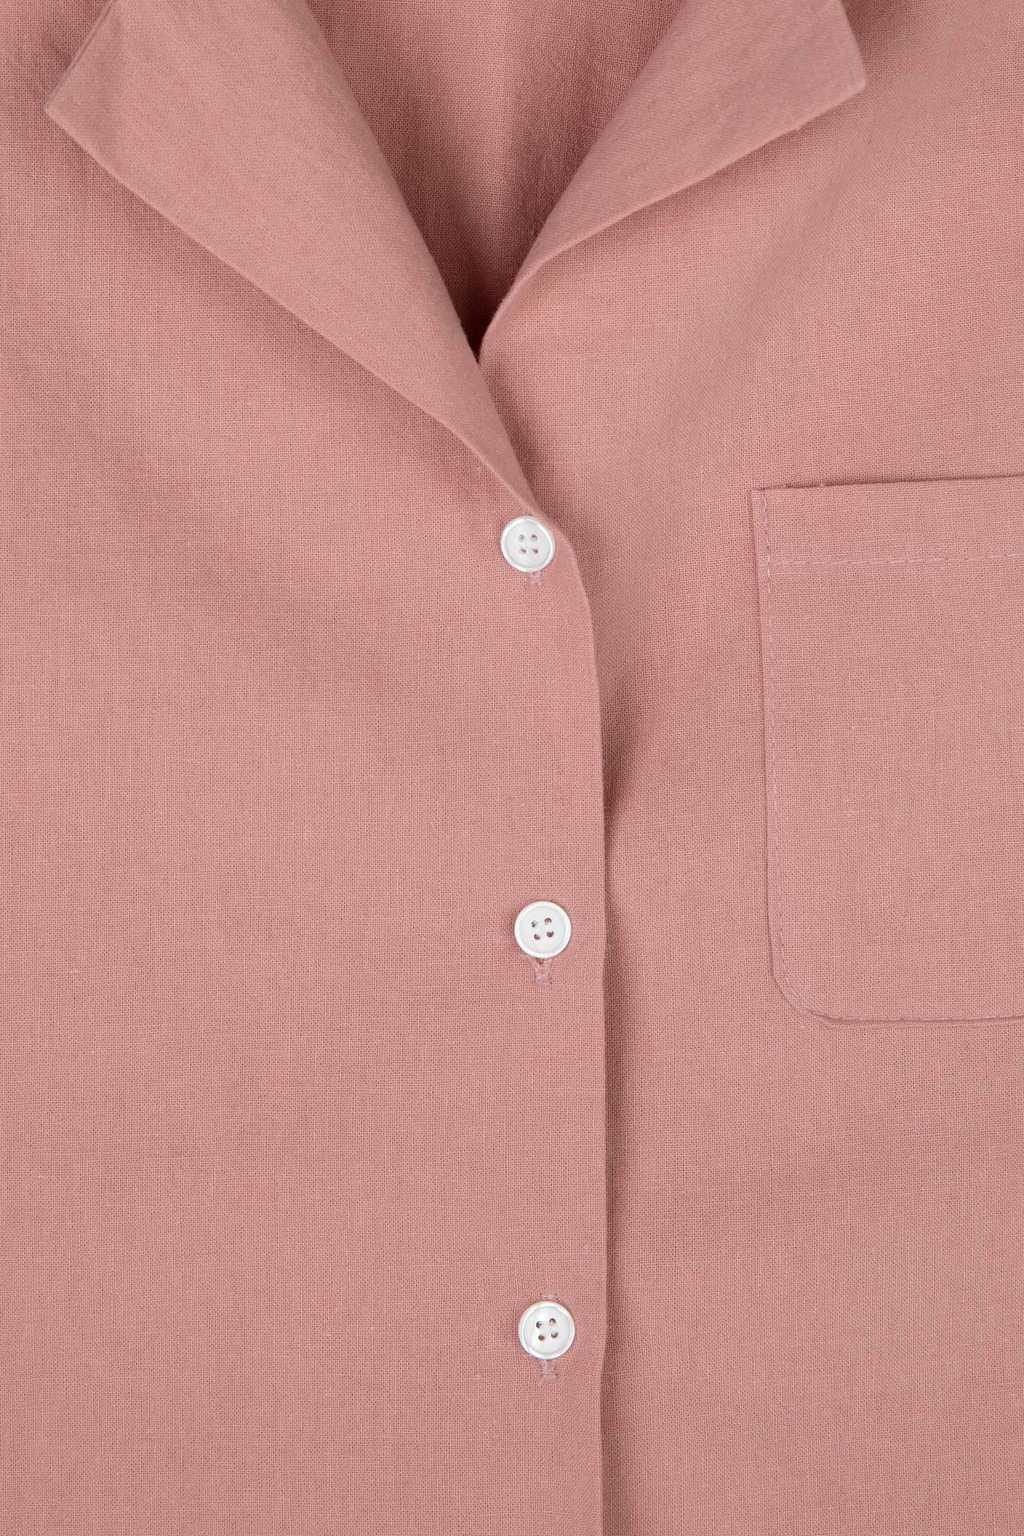 Blouse K027 Pink 11